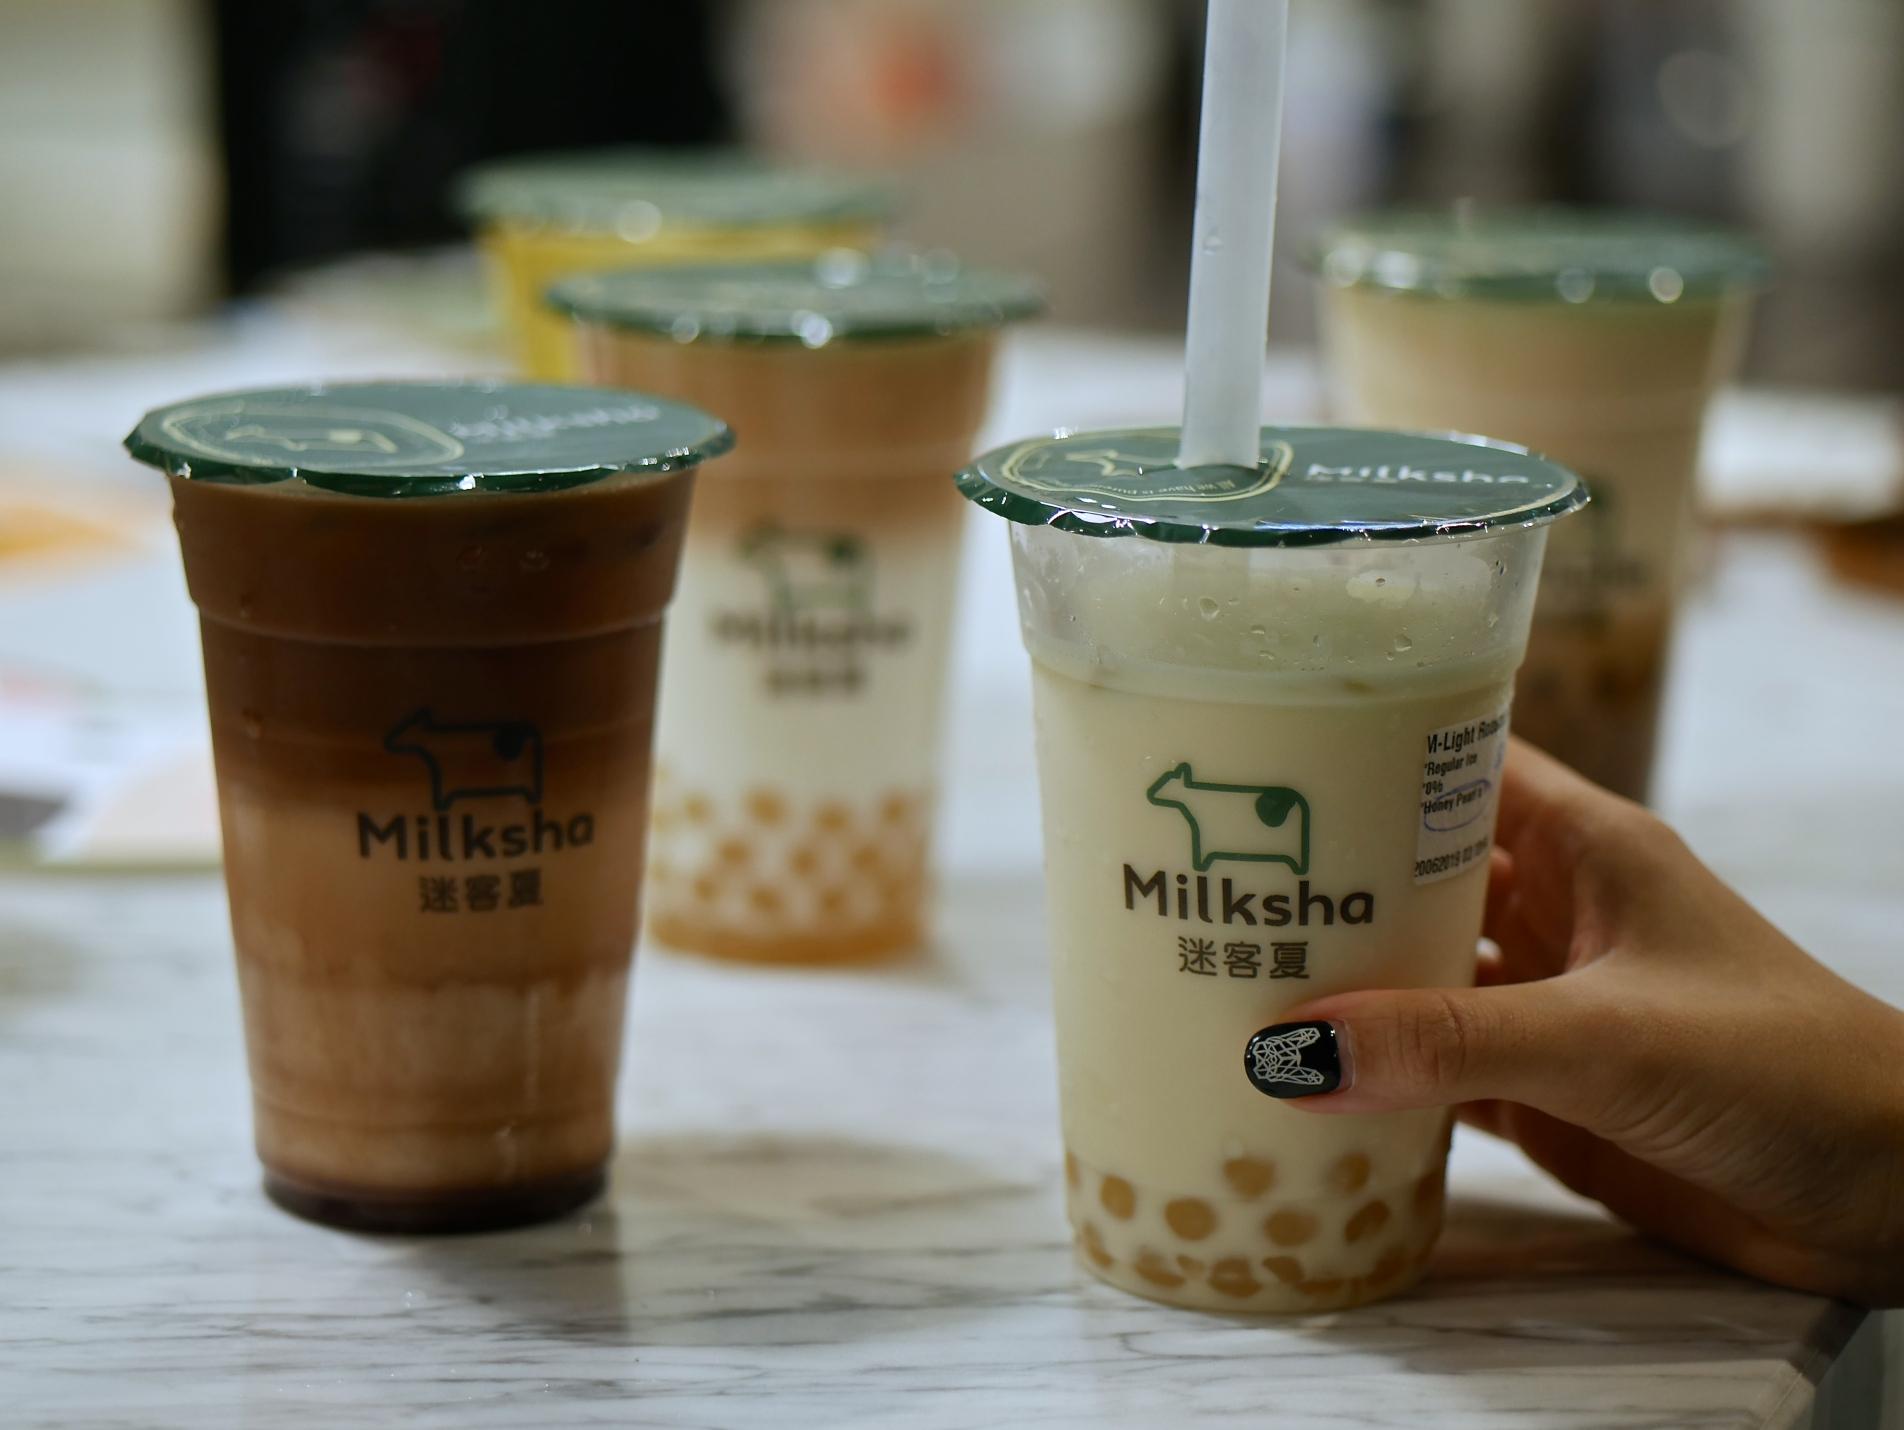 Taiwanese Bubble-Tea Chain Milksha 迷客夏 Debuts In